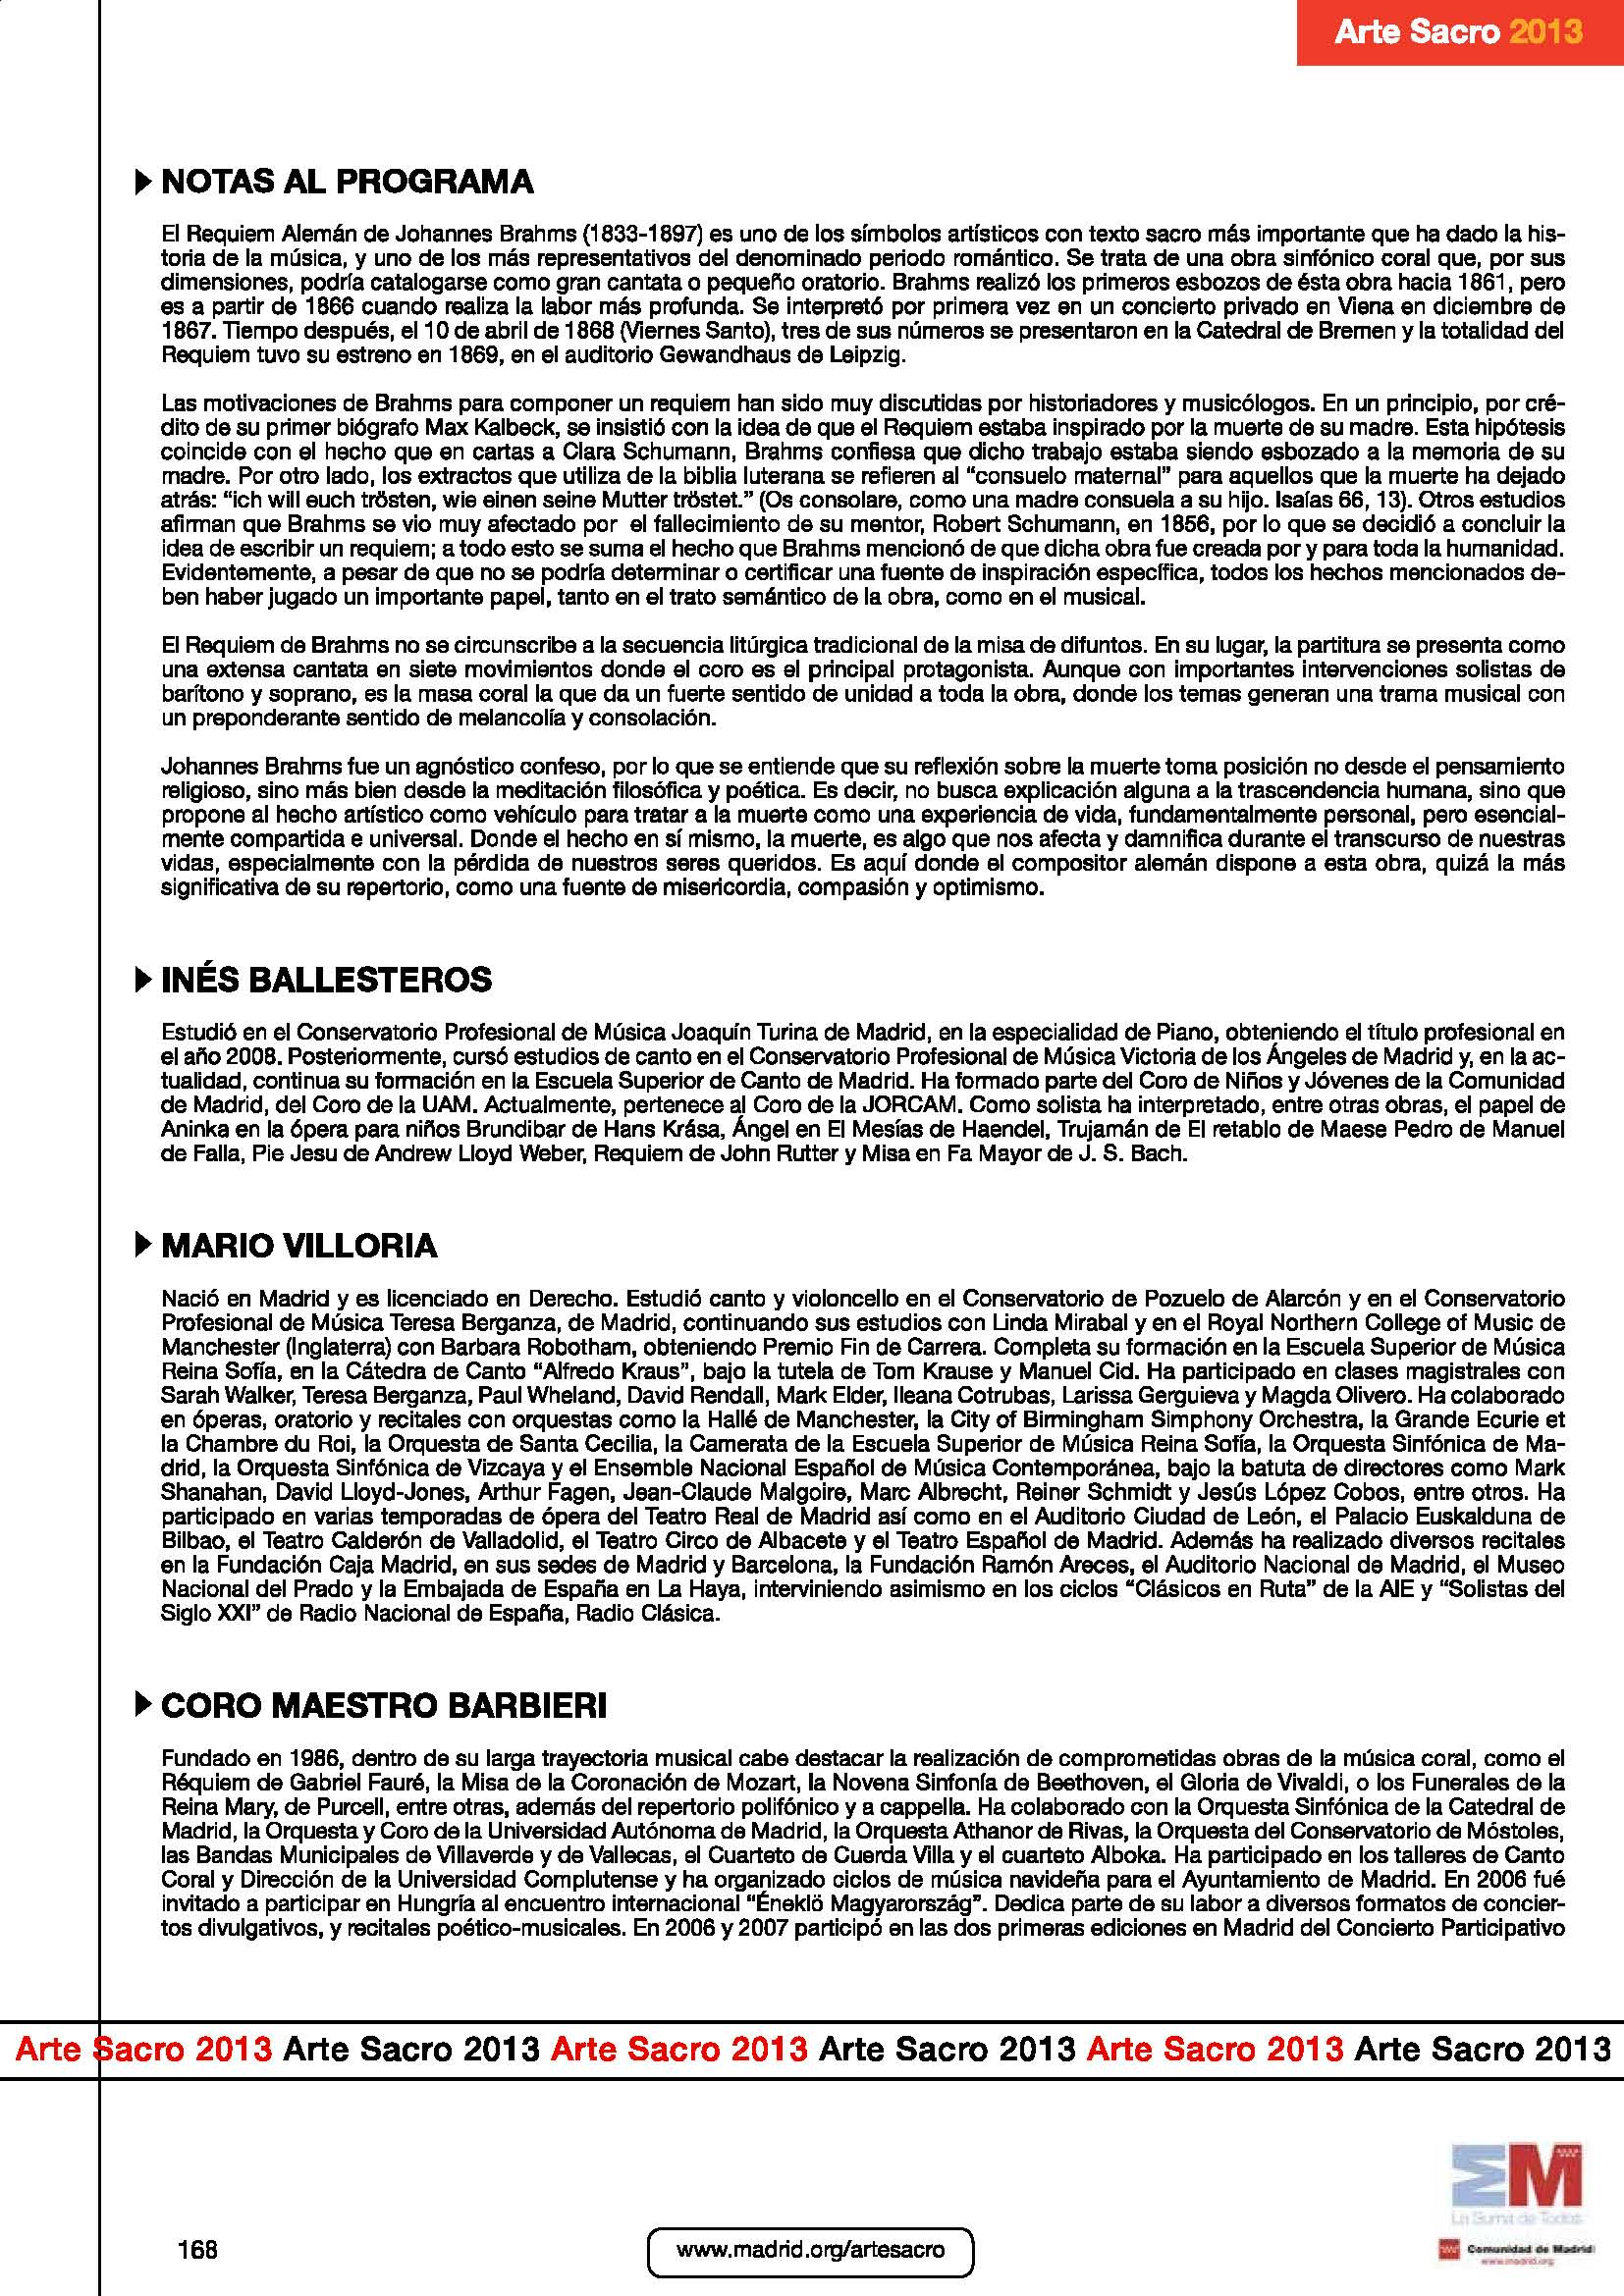 dossier_completo_Página_168